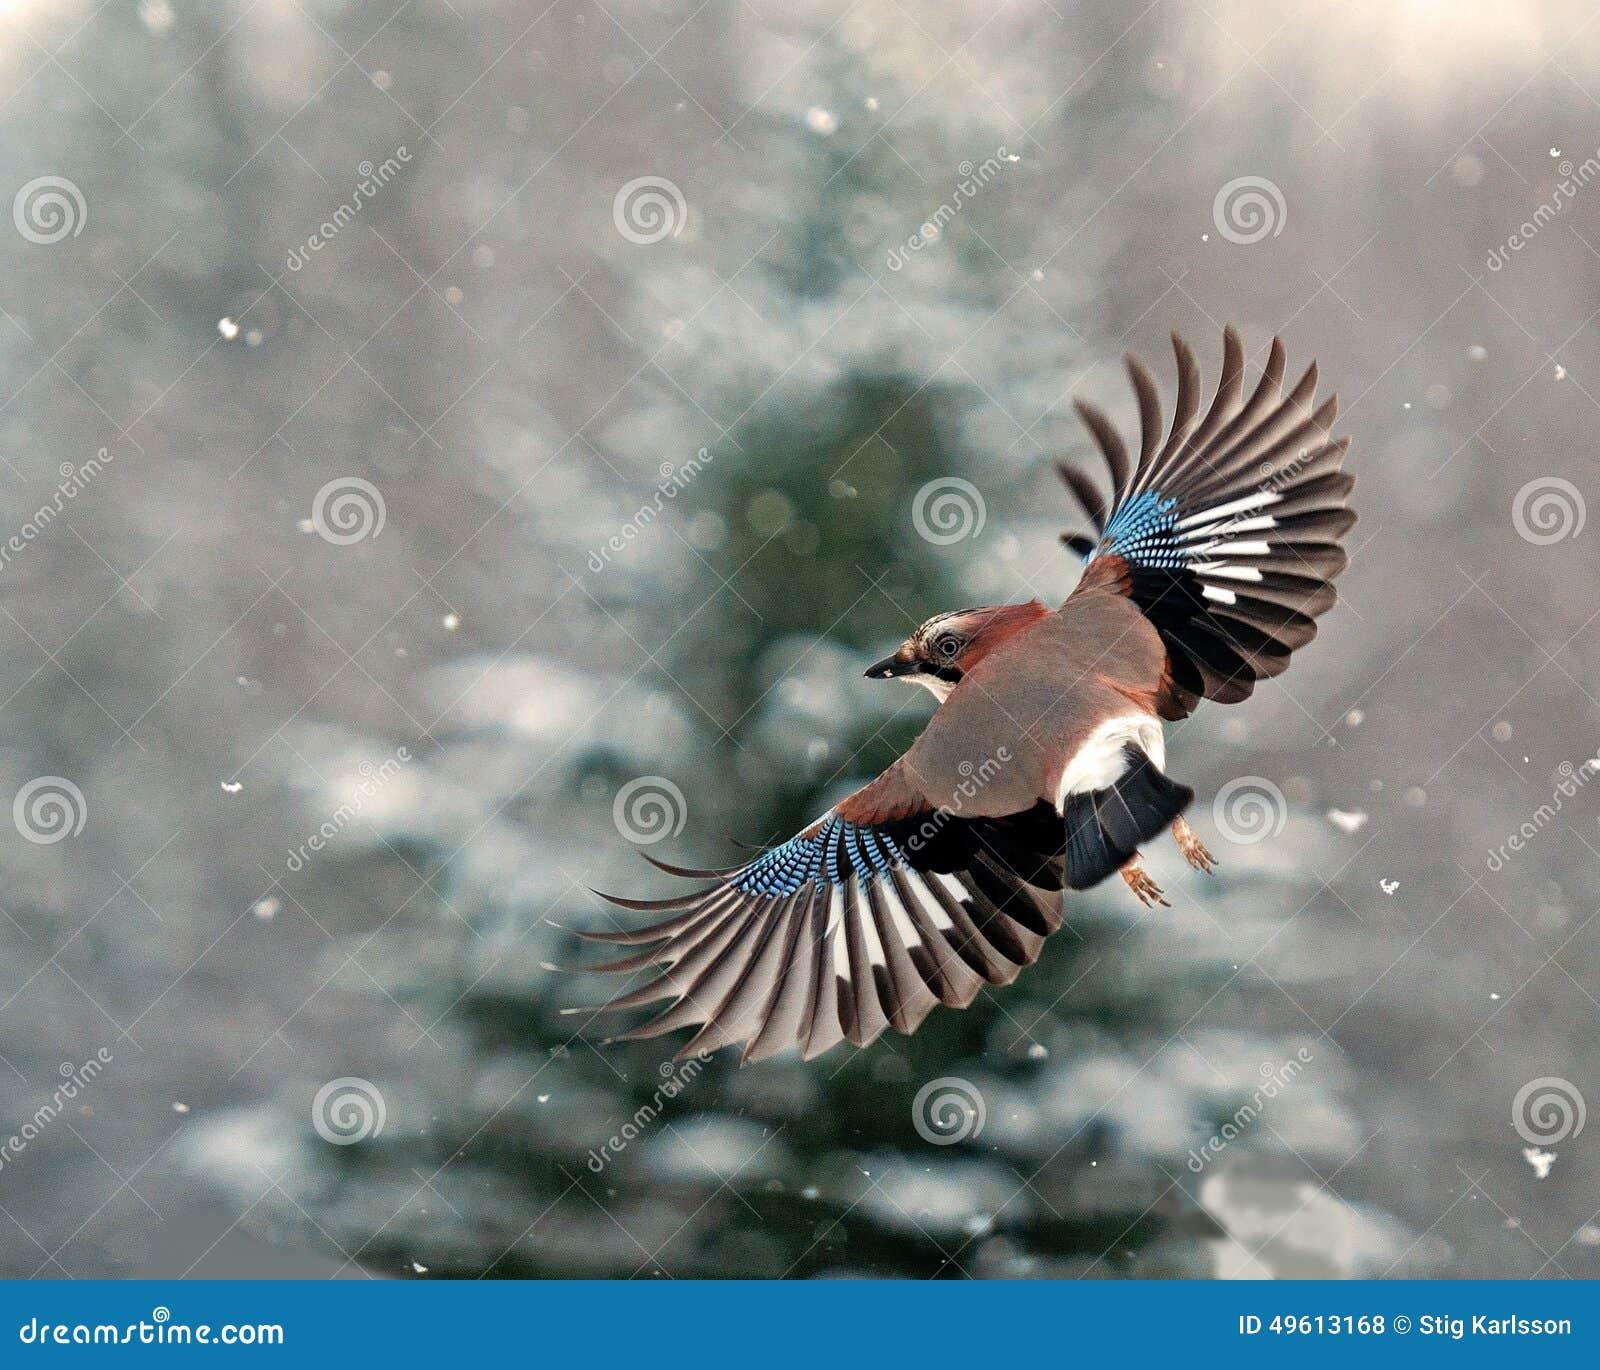 Europees-Aziatische Vlaamse gaai, Garrulus-glandarius die in dalende sneeuw vliegen